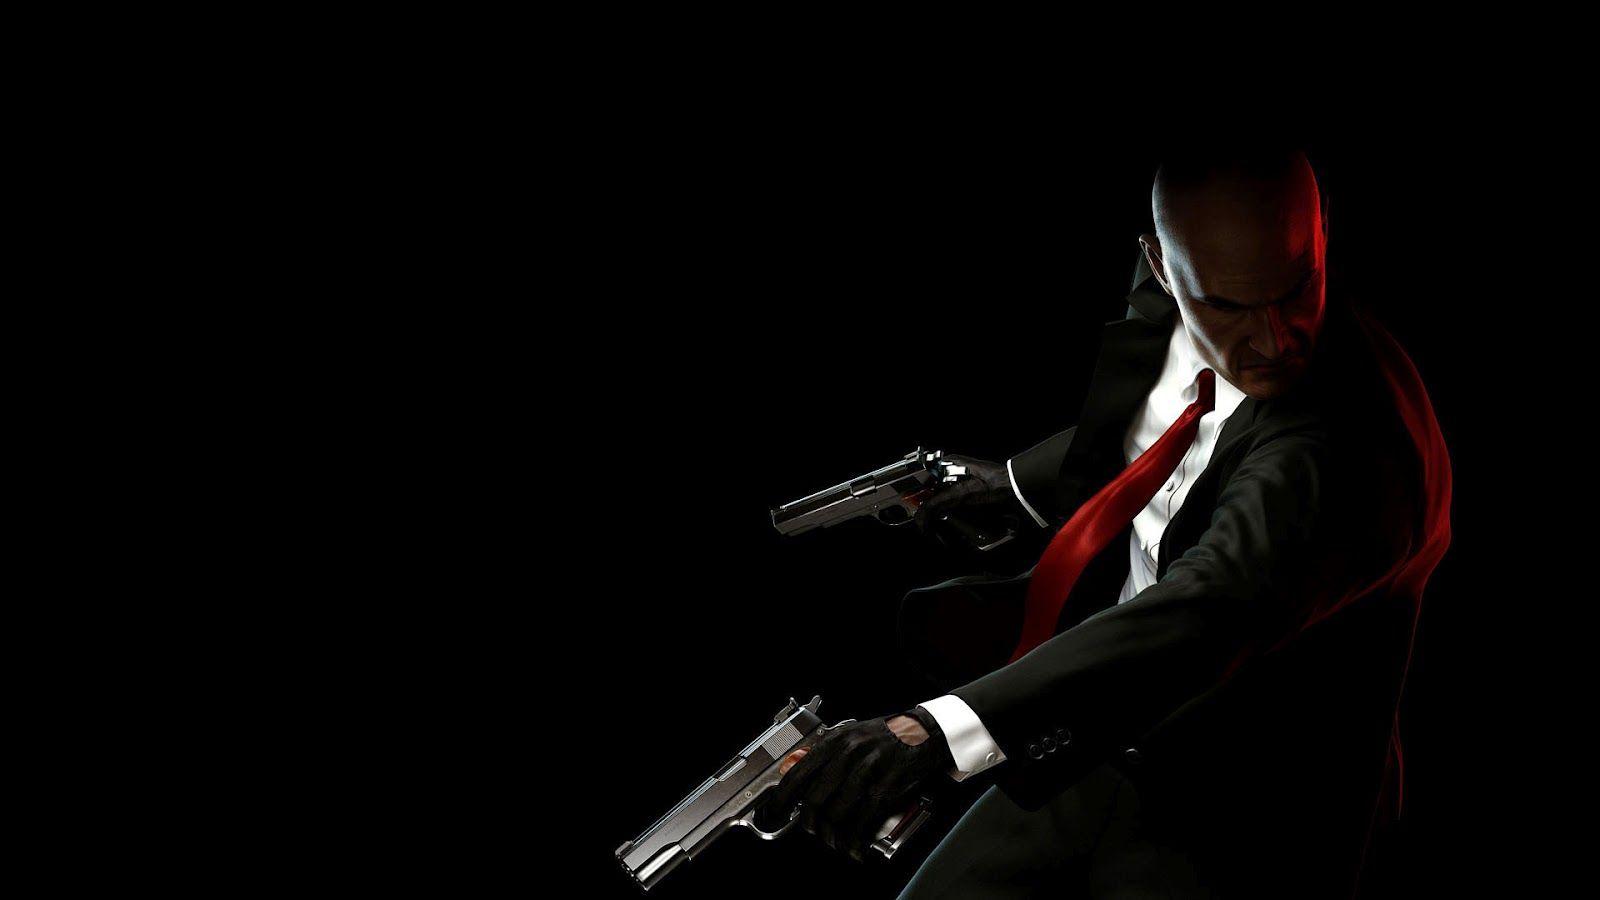 Video Game Hitman Absolution Minimal 1080x2160 Wallpaper Hitman Agent 47 Agent 47 Hitman